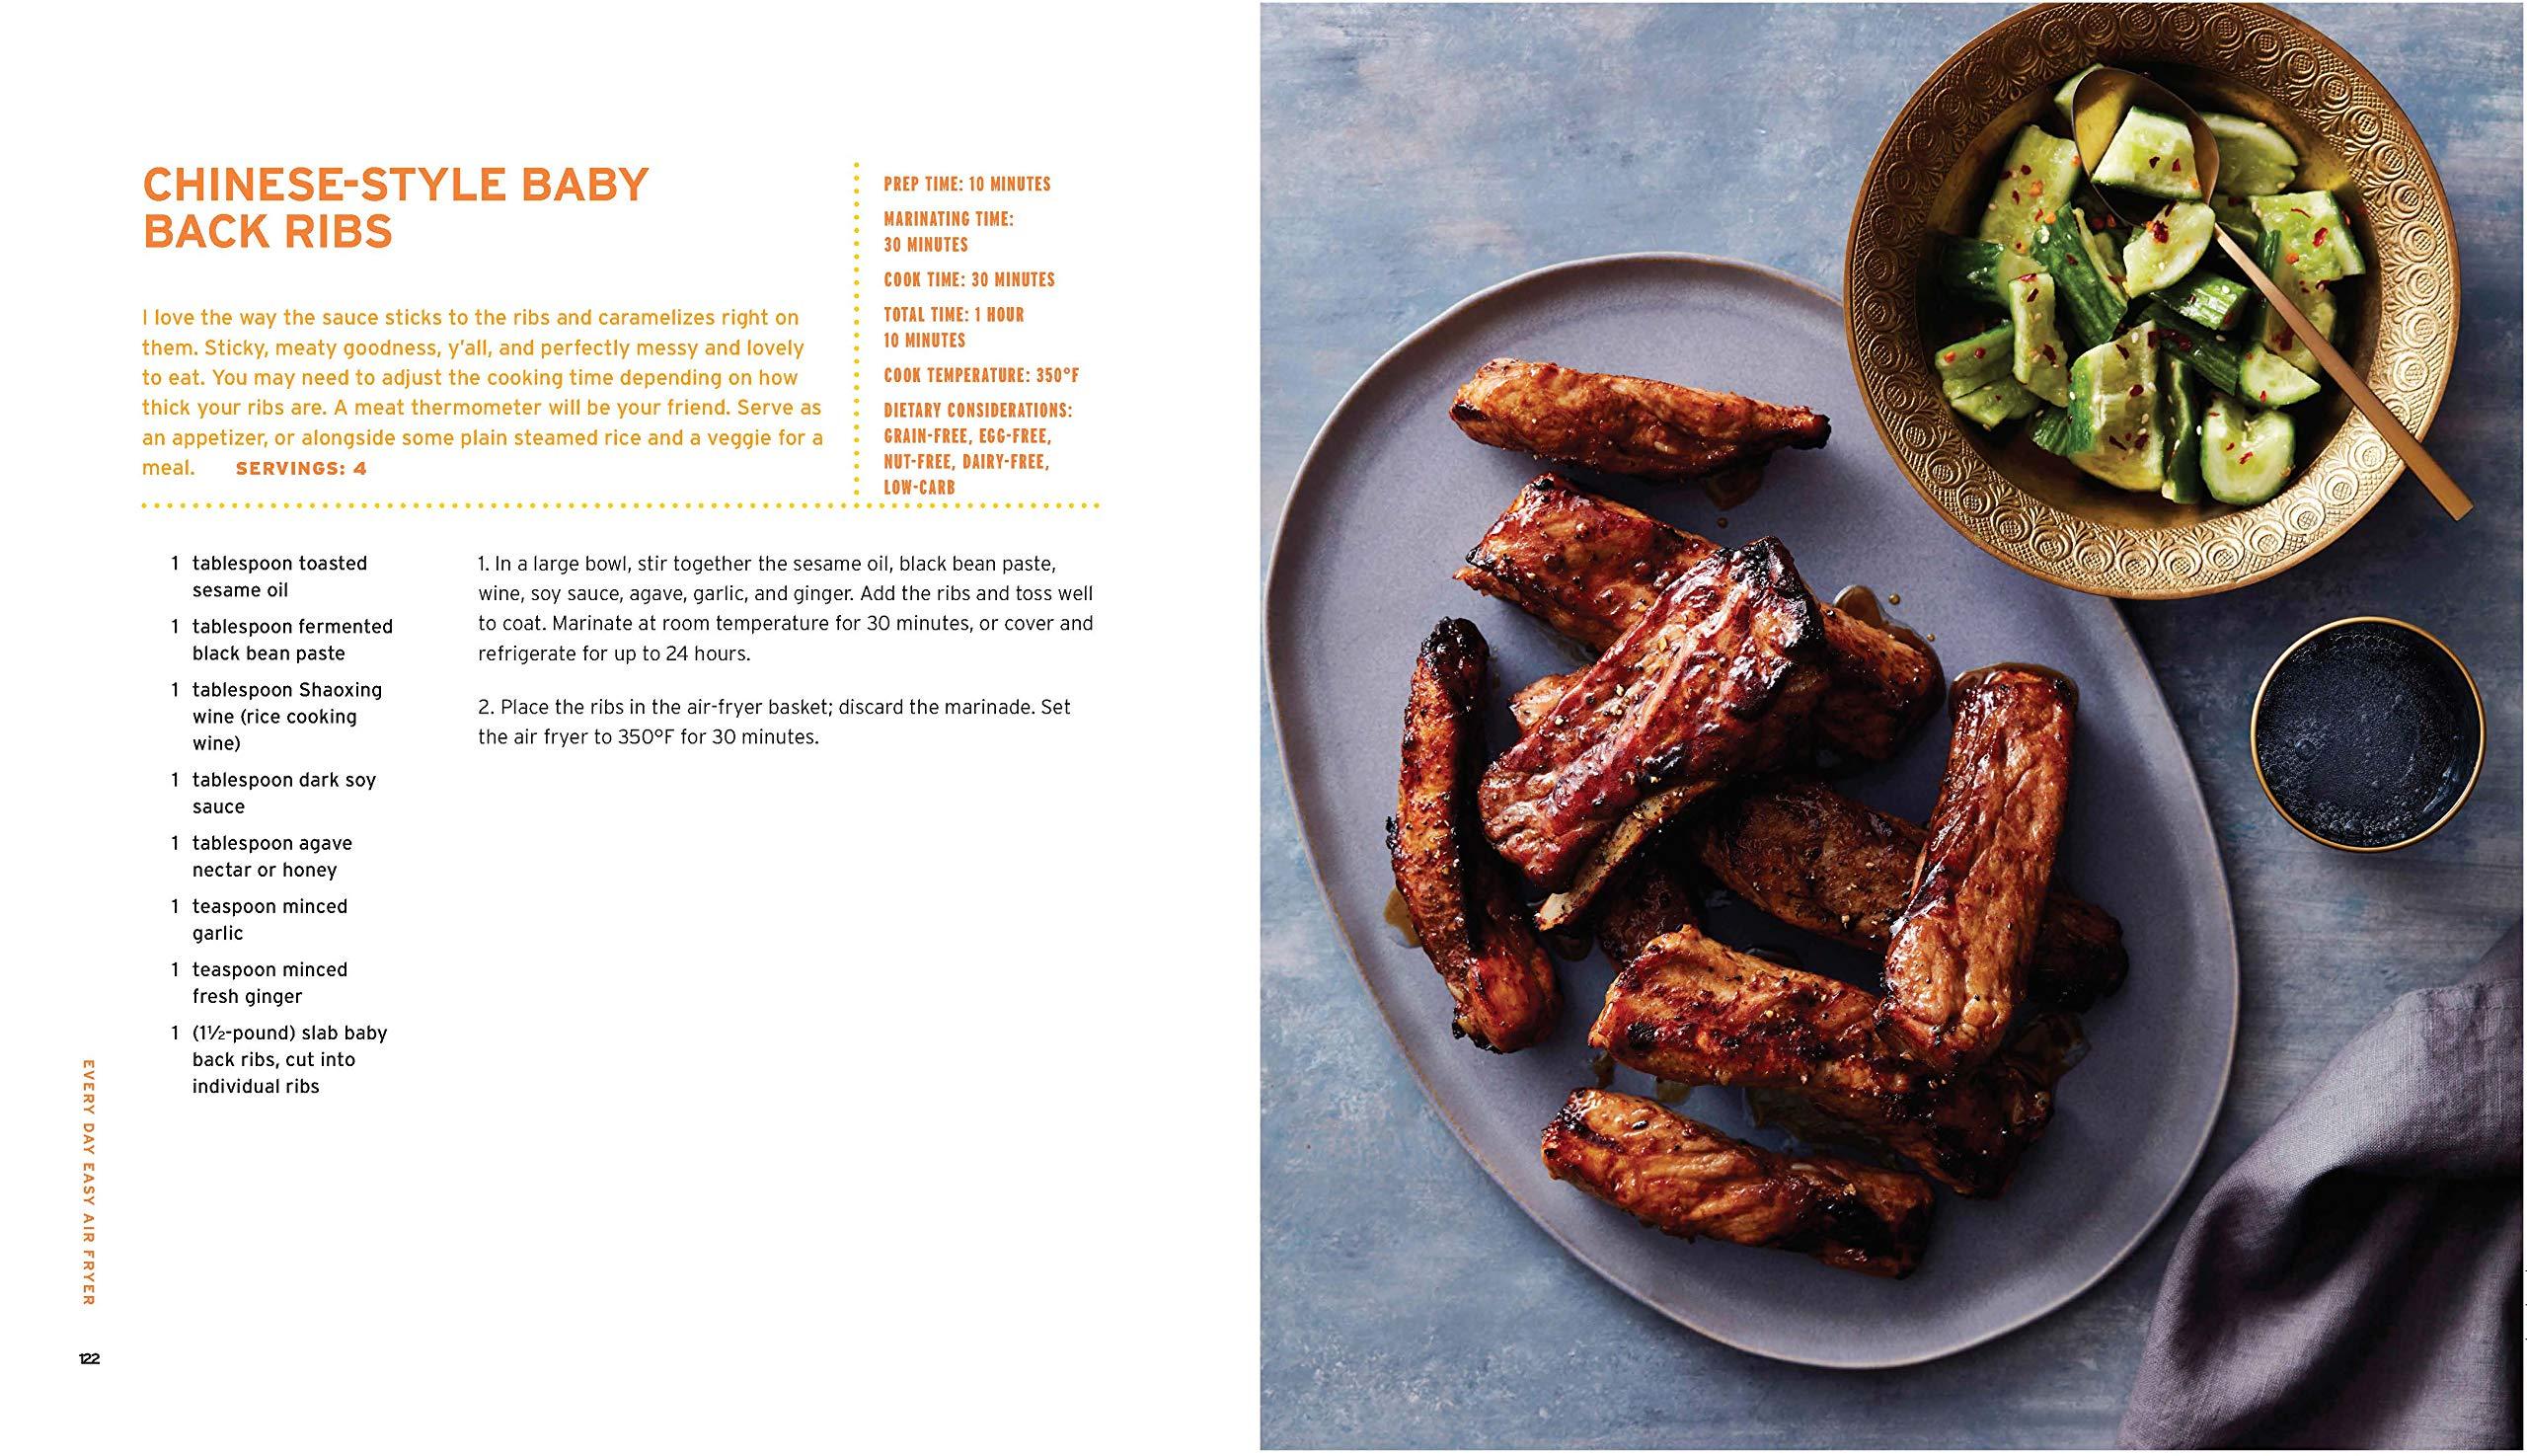 Every Day Easy Air Fryer: 100 Recipes Bursting with Flavor: Amazon.es: Urvashi Pitre: Libros en idiomas extranjeros